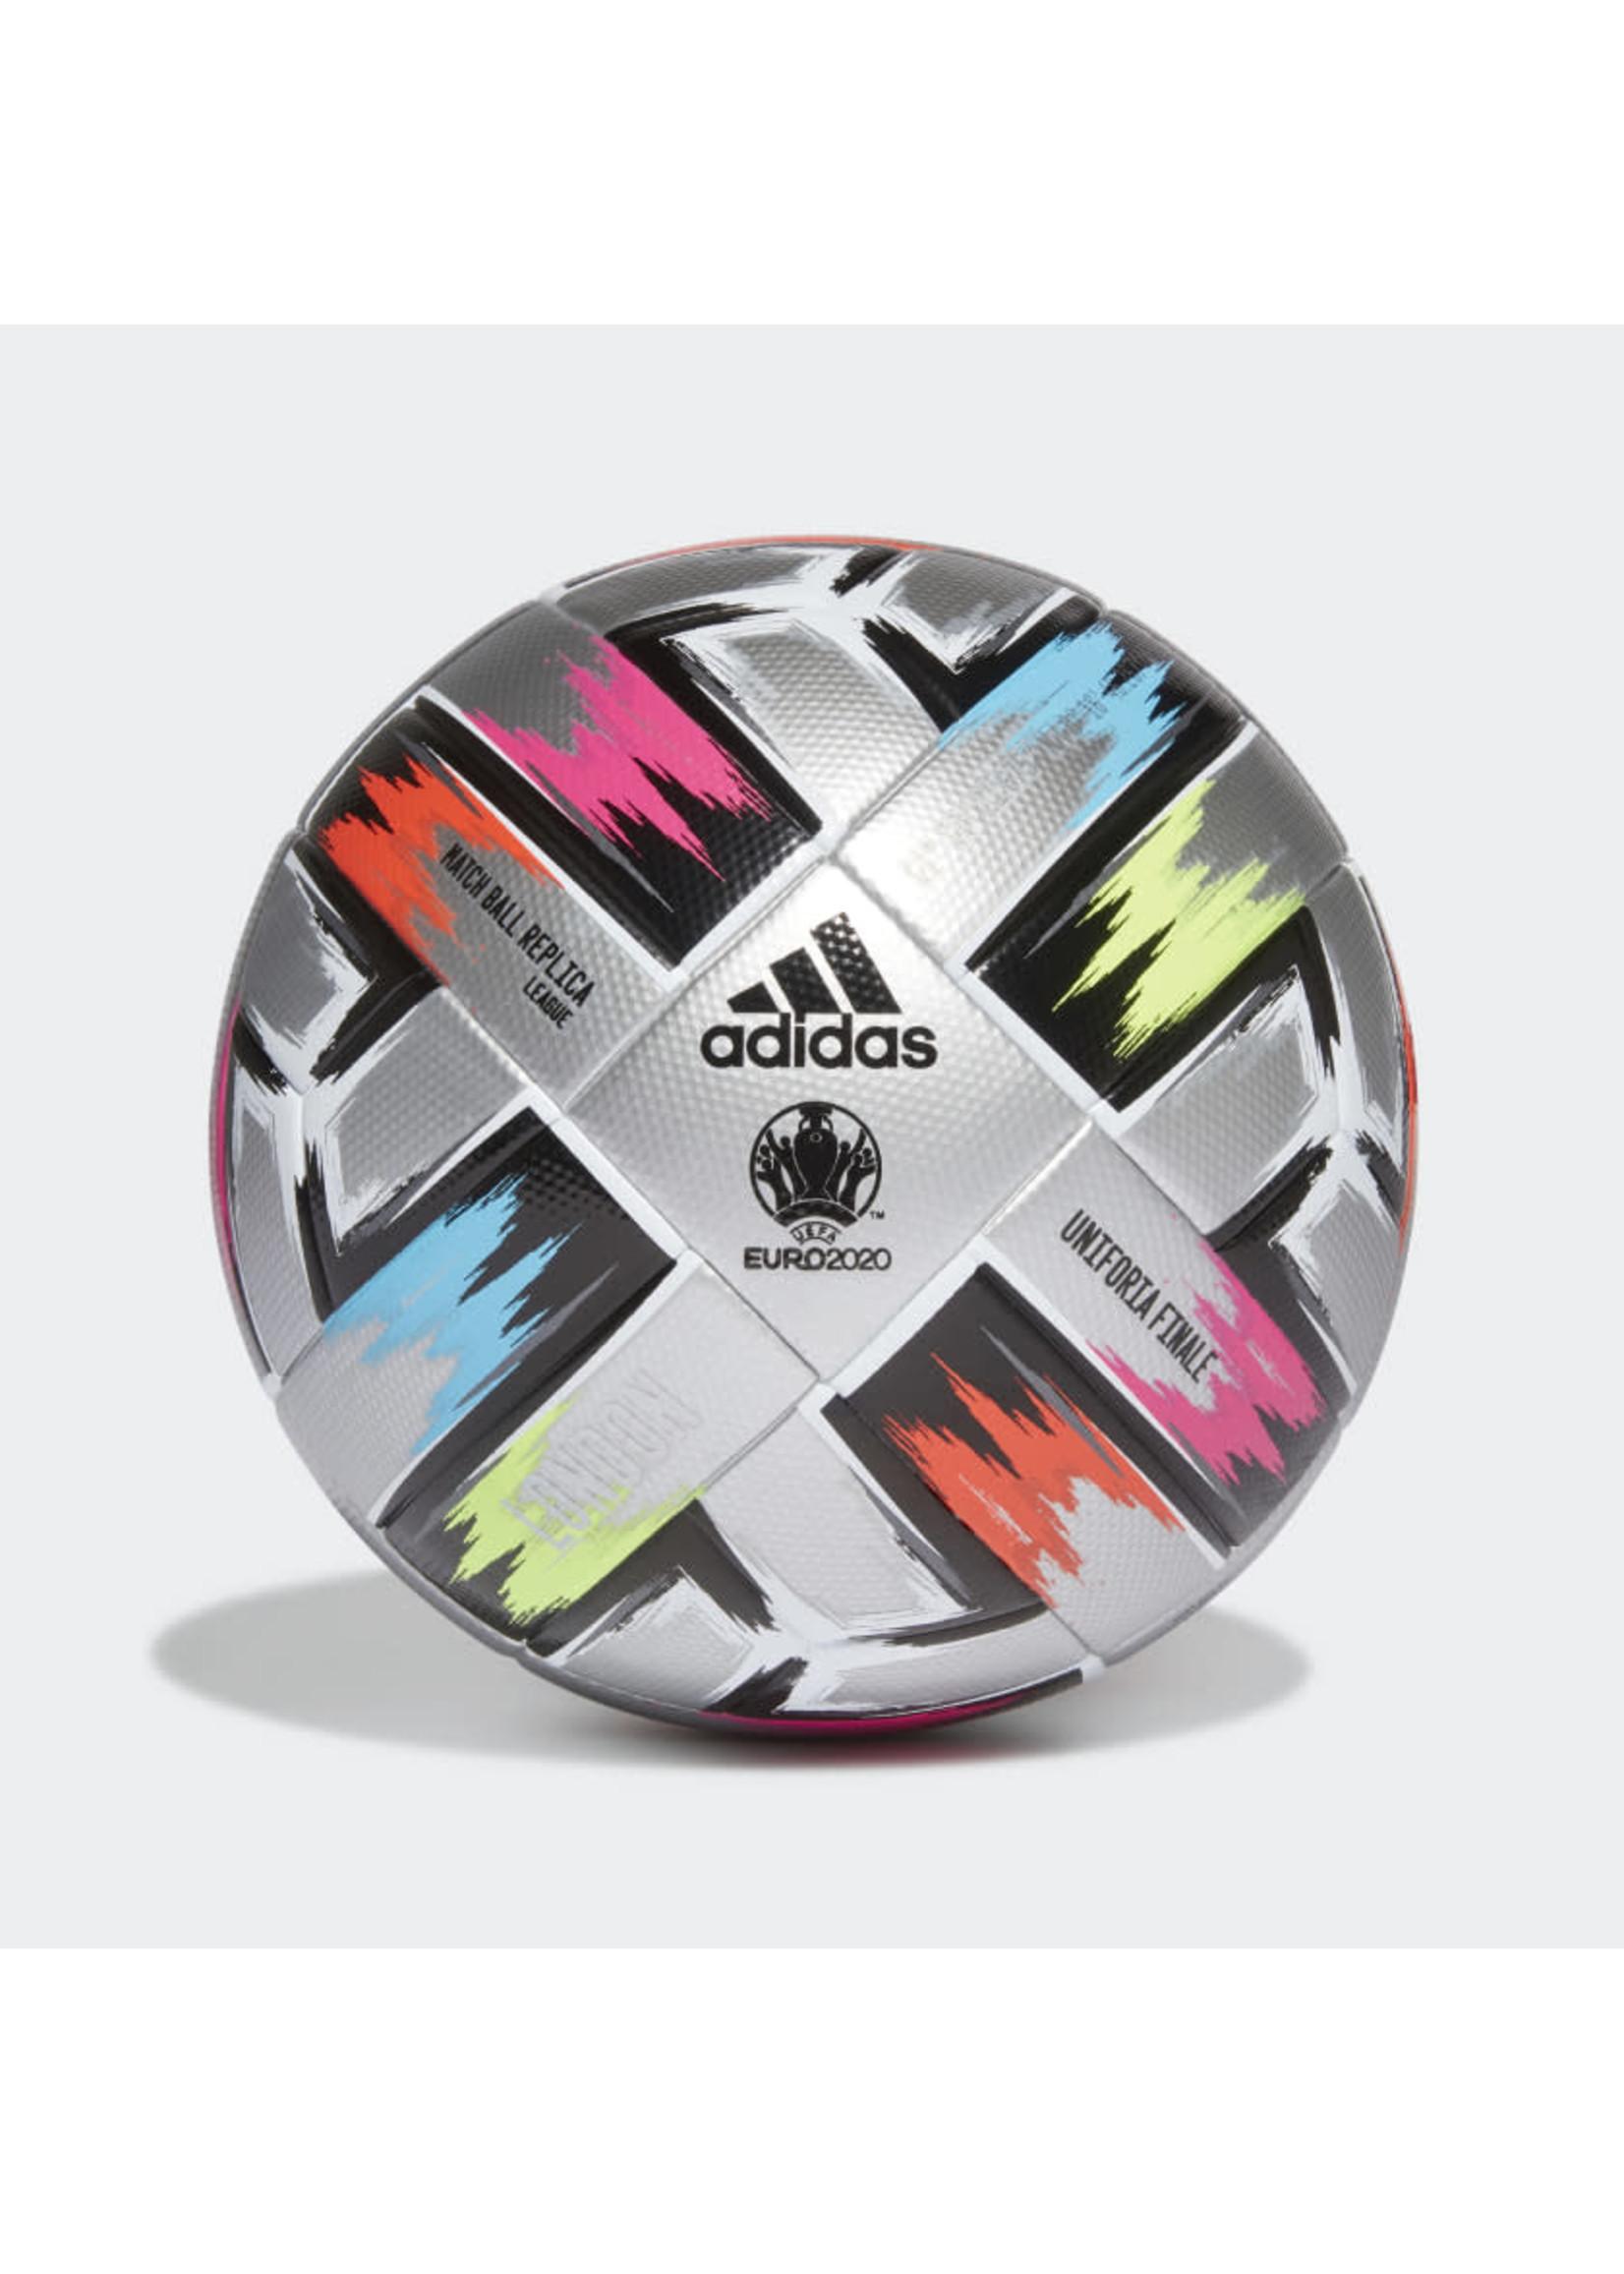 Adidas Euro 2020 Final League Ball